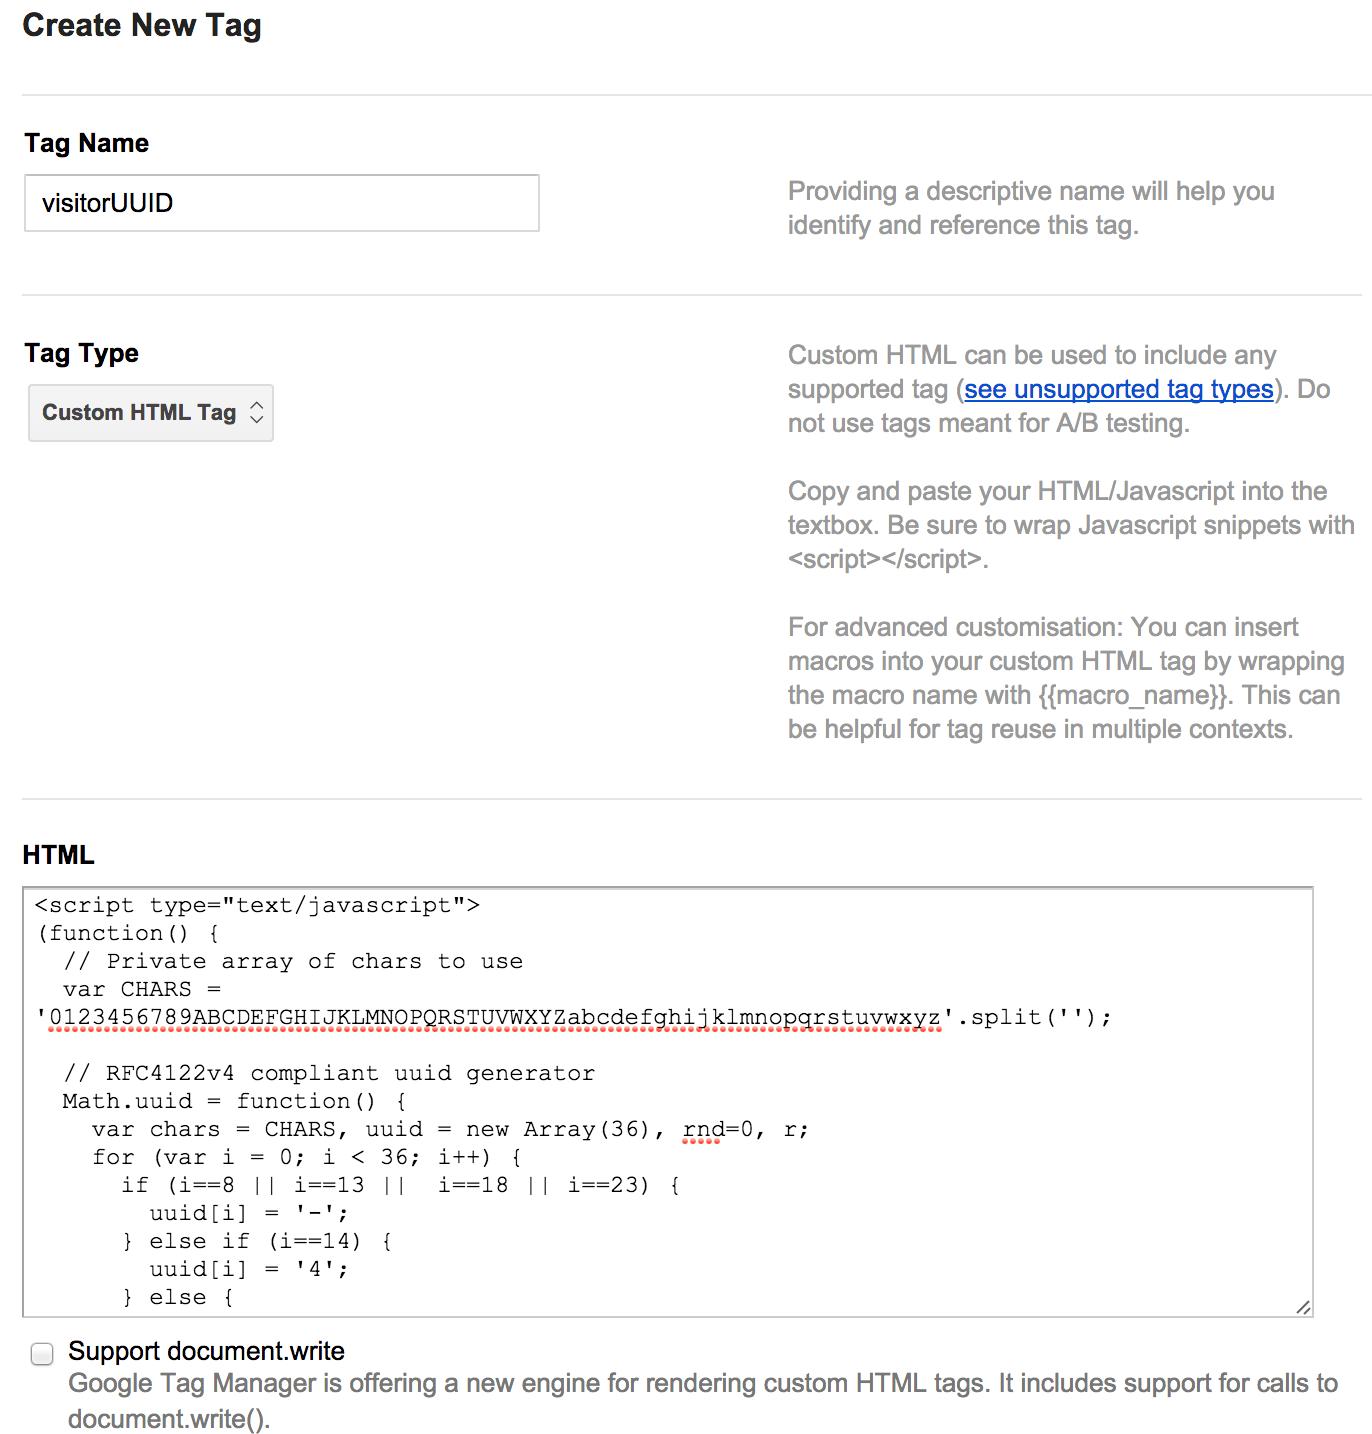 RFC4122v4 compliant Visitor UUID GTM Tag